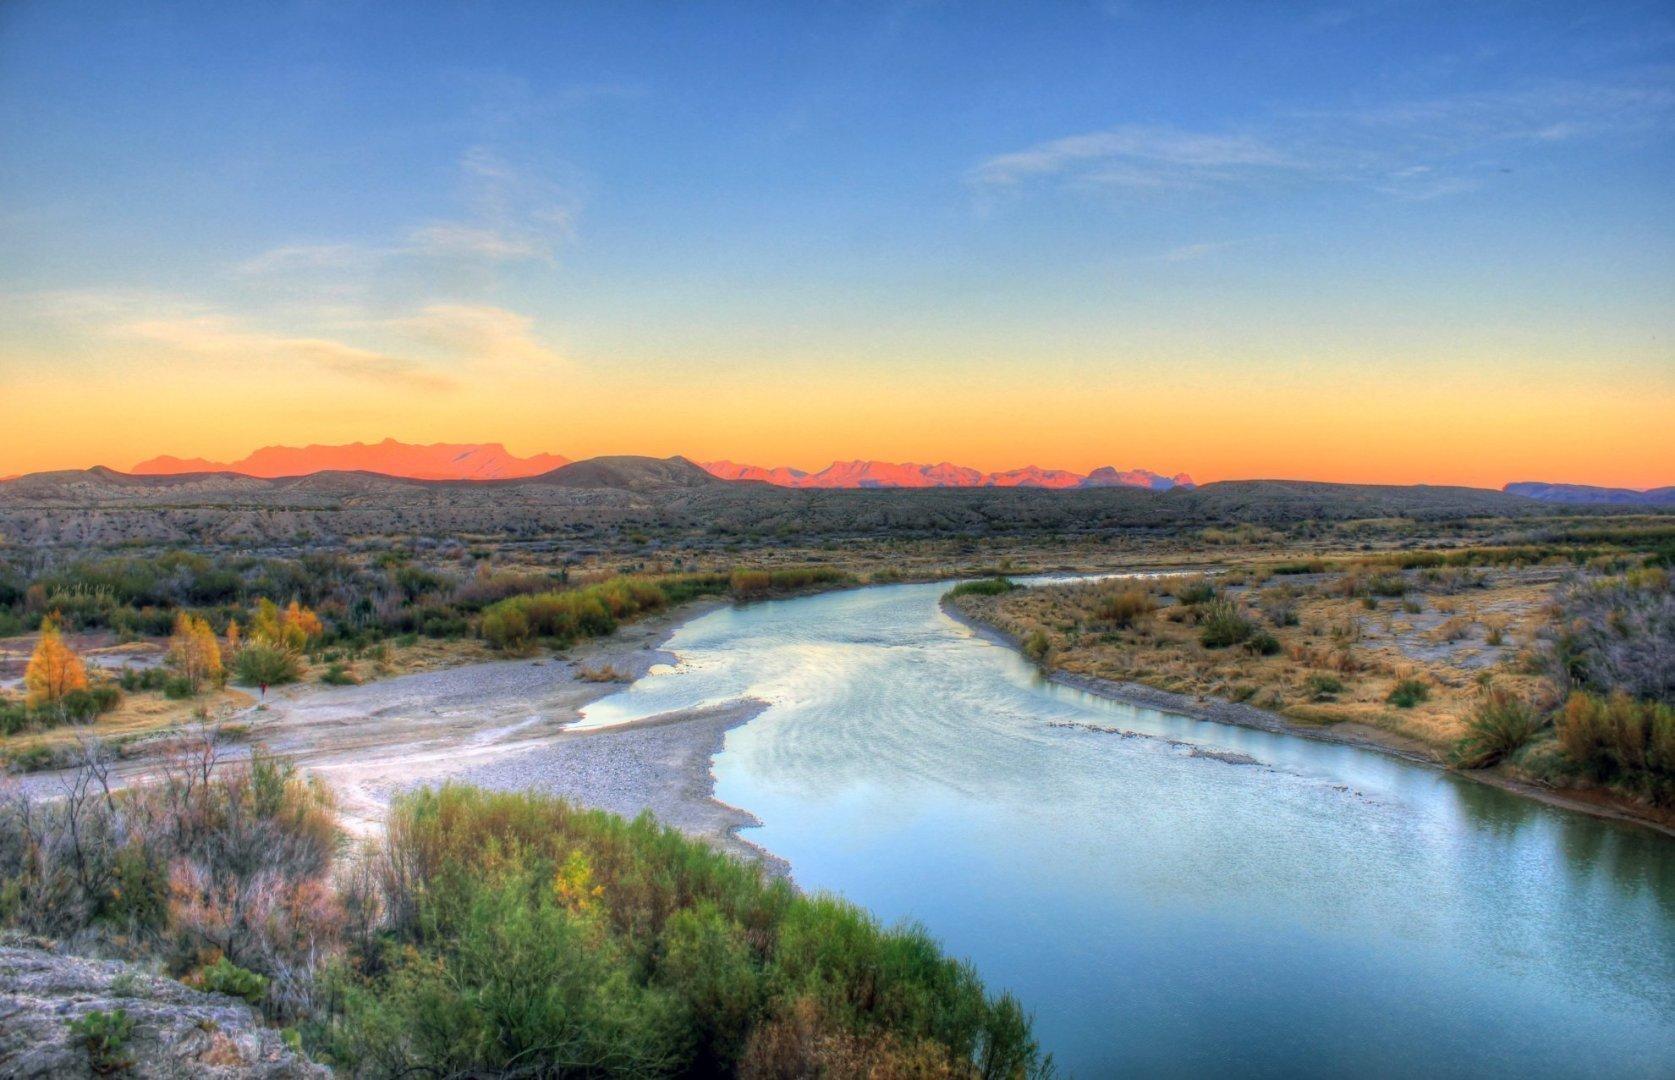 Big Bend National Park | Public Domain/Goodfreephotos.com